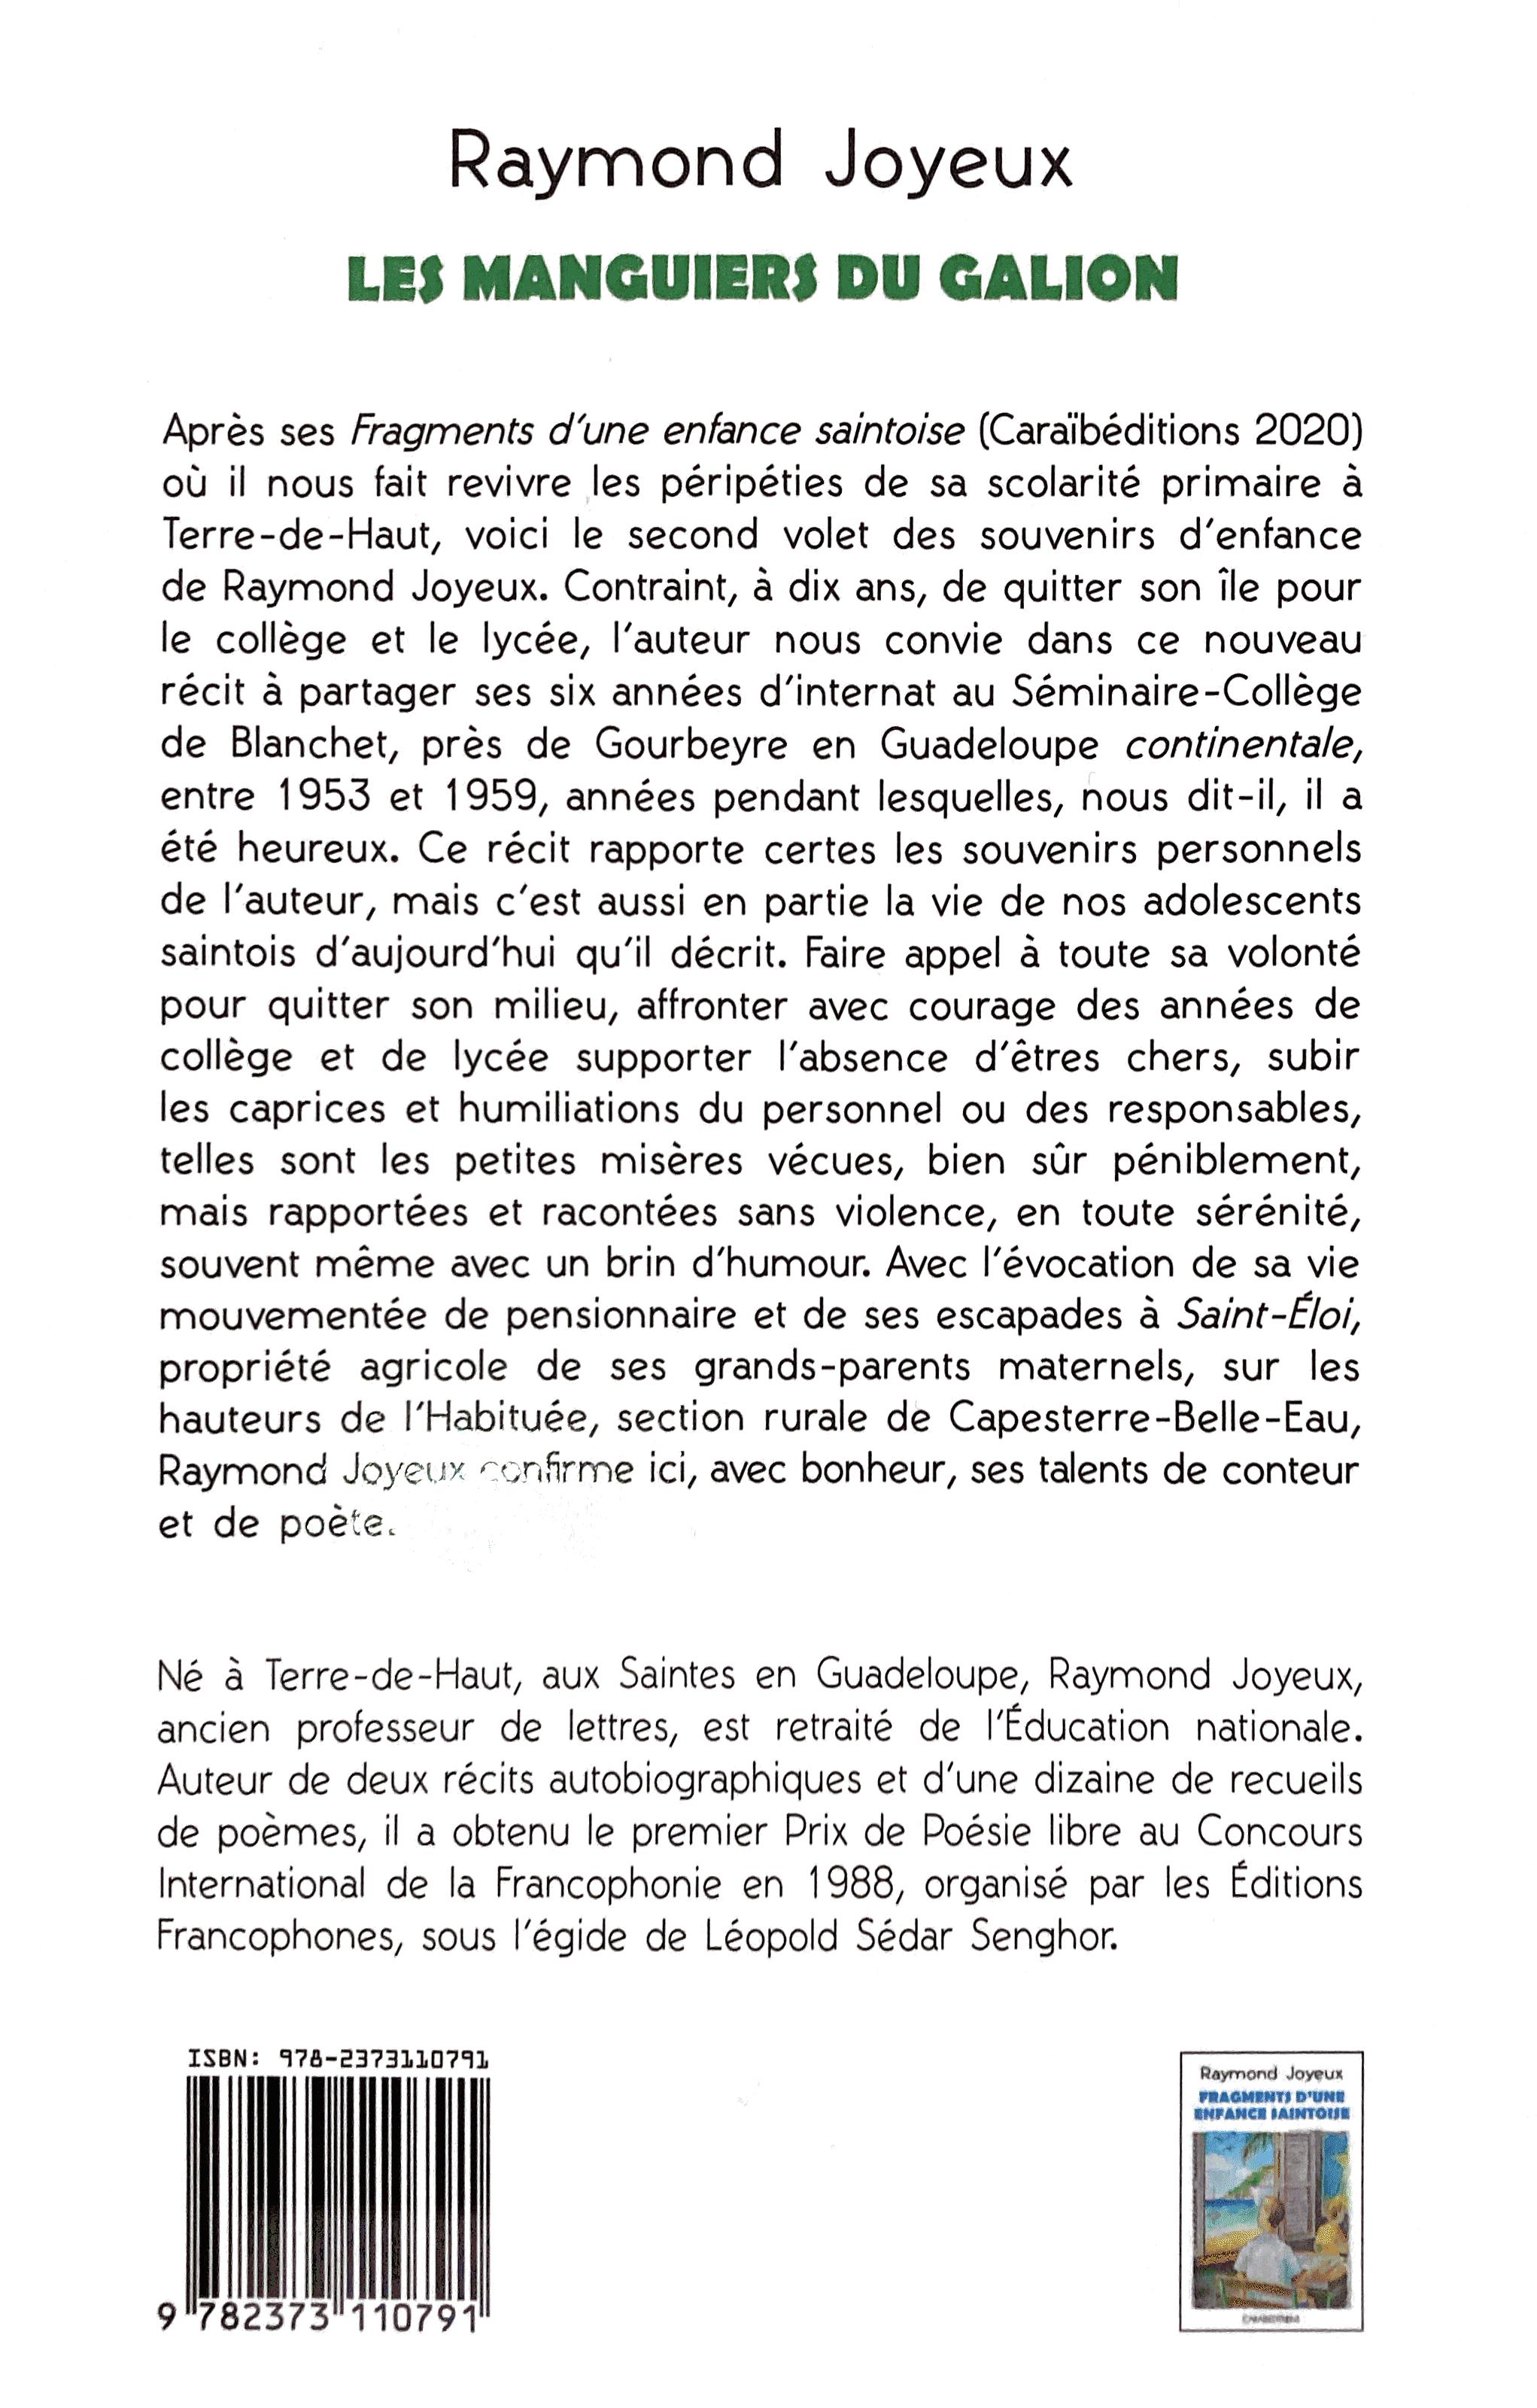 Document Scannable le 8 févr. 2021 à 08_39_45